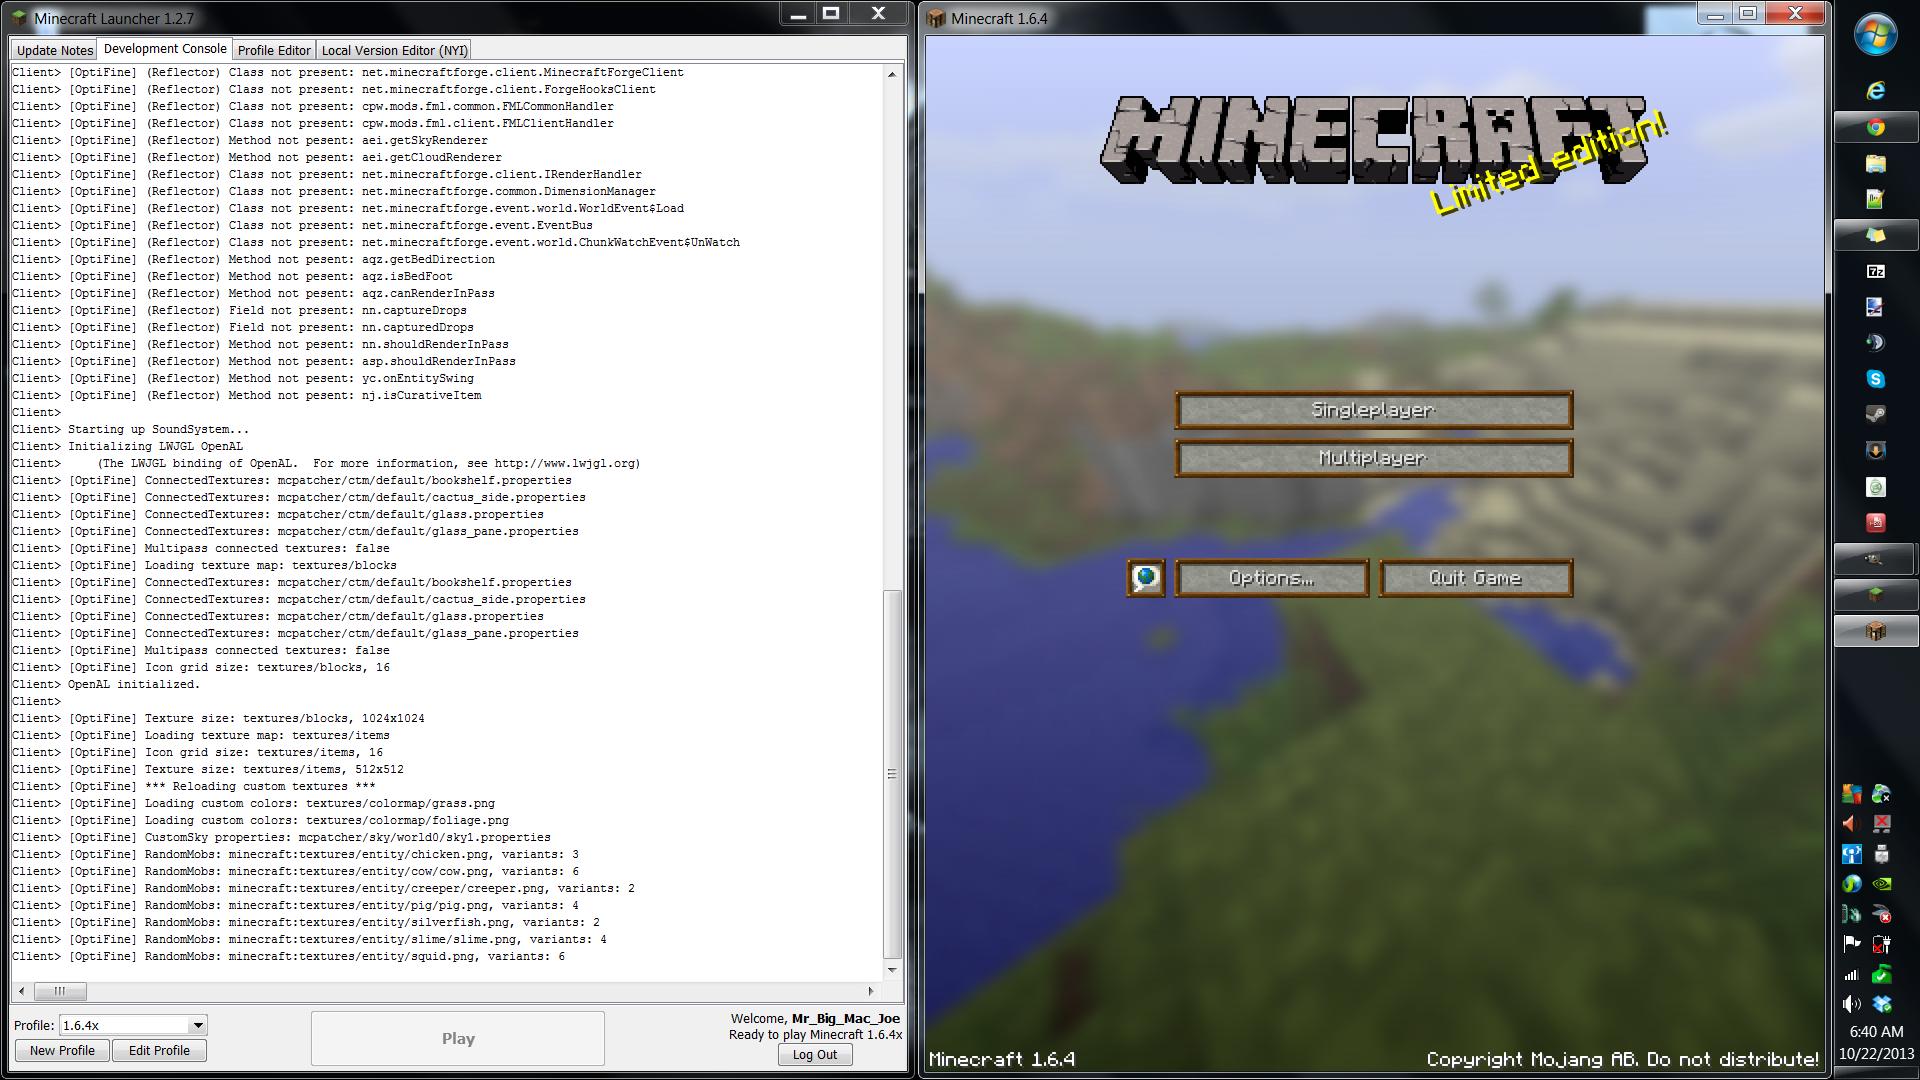 Beautiful Wallpaper Minecraft Home Screen - 68747470733a2f2f662e636c6f75642e6769746875622e636f6d2f6173736574732f343233383439332f313338303433362f32303834376563342d336230372d313165332d383565392d3465333037373734326466362e706e67  Graphic_976765.com/b51b0c5df4578b018540810dbd8ff53d452fe4f4/68747470733a2f2f662e636c6f75642e6769746875622e636f6d2f6173736574732f343233383439332f313338303433362f32303834376563342d336230372d313165332d383565392d3465333037373734326466362e706e67